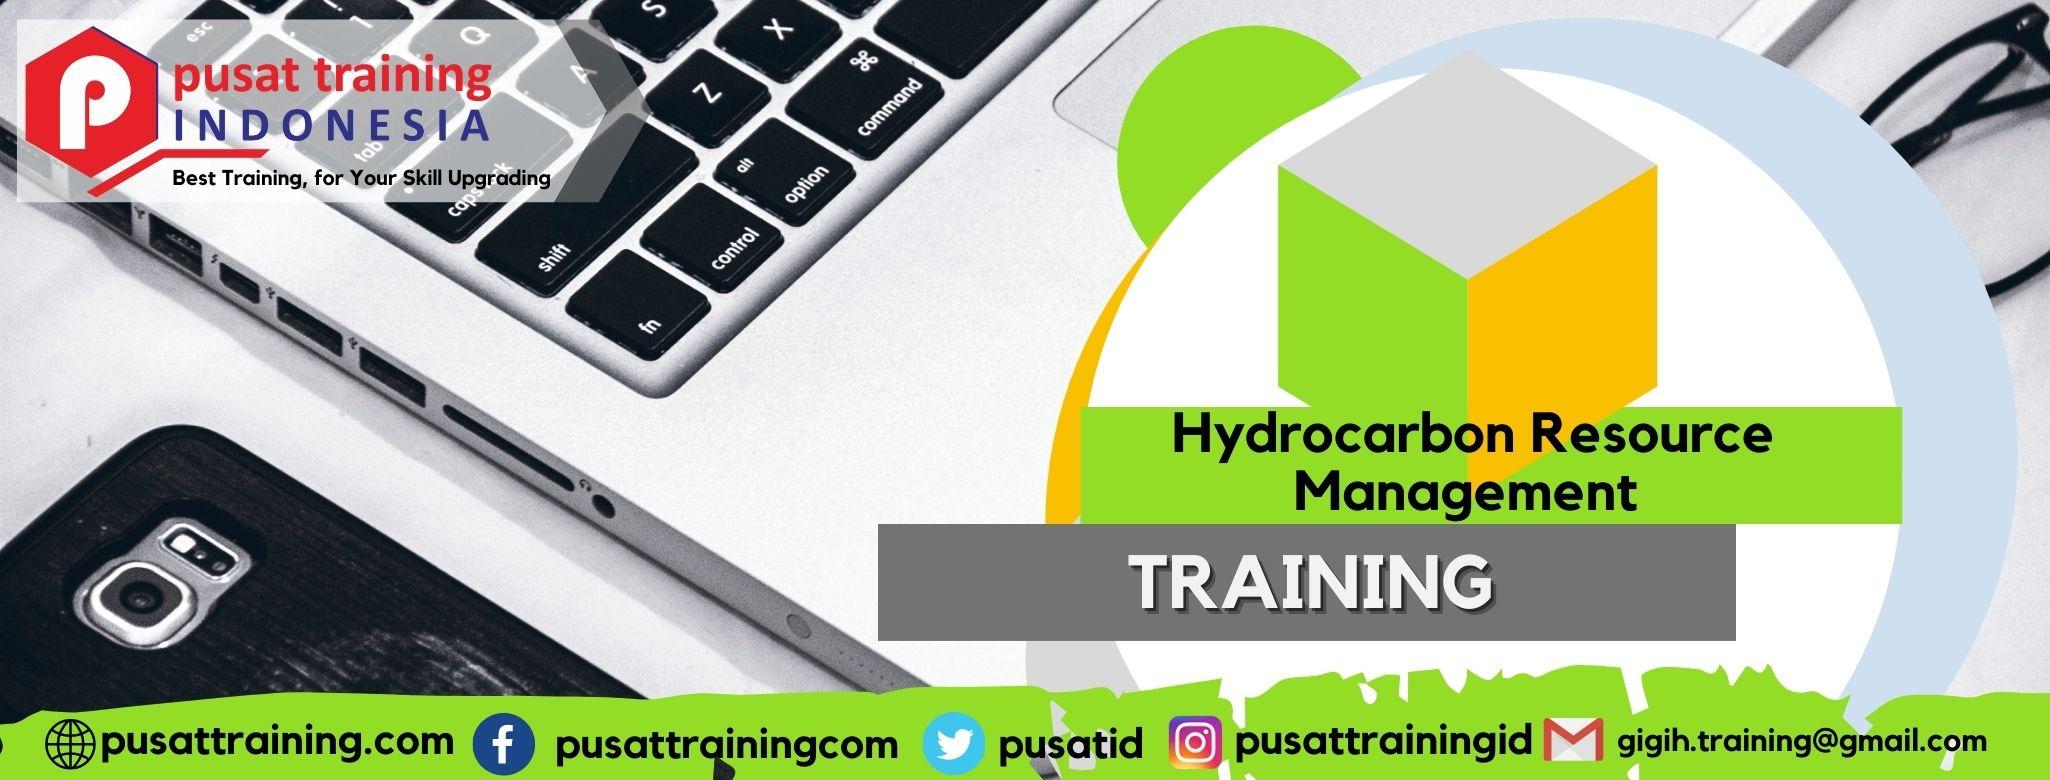 Hydrocarbon Resource Management Training